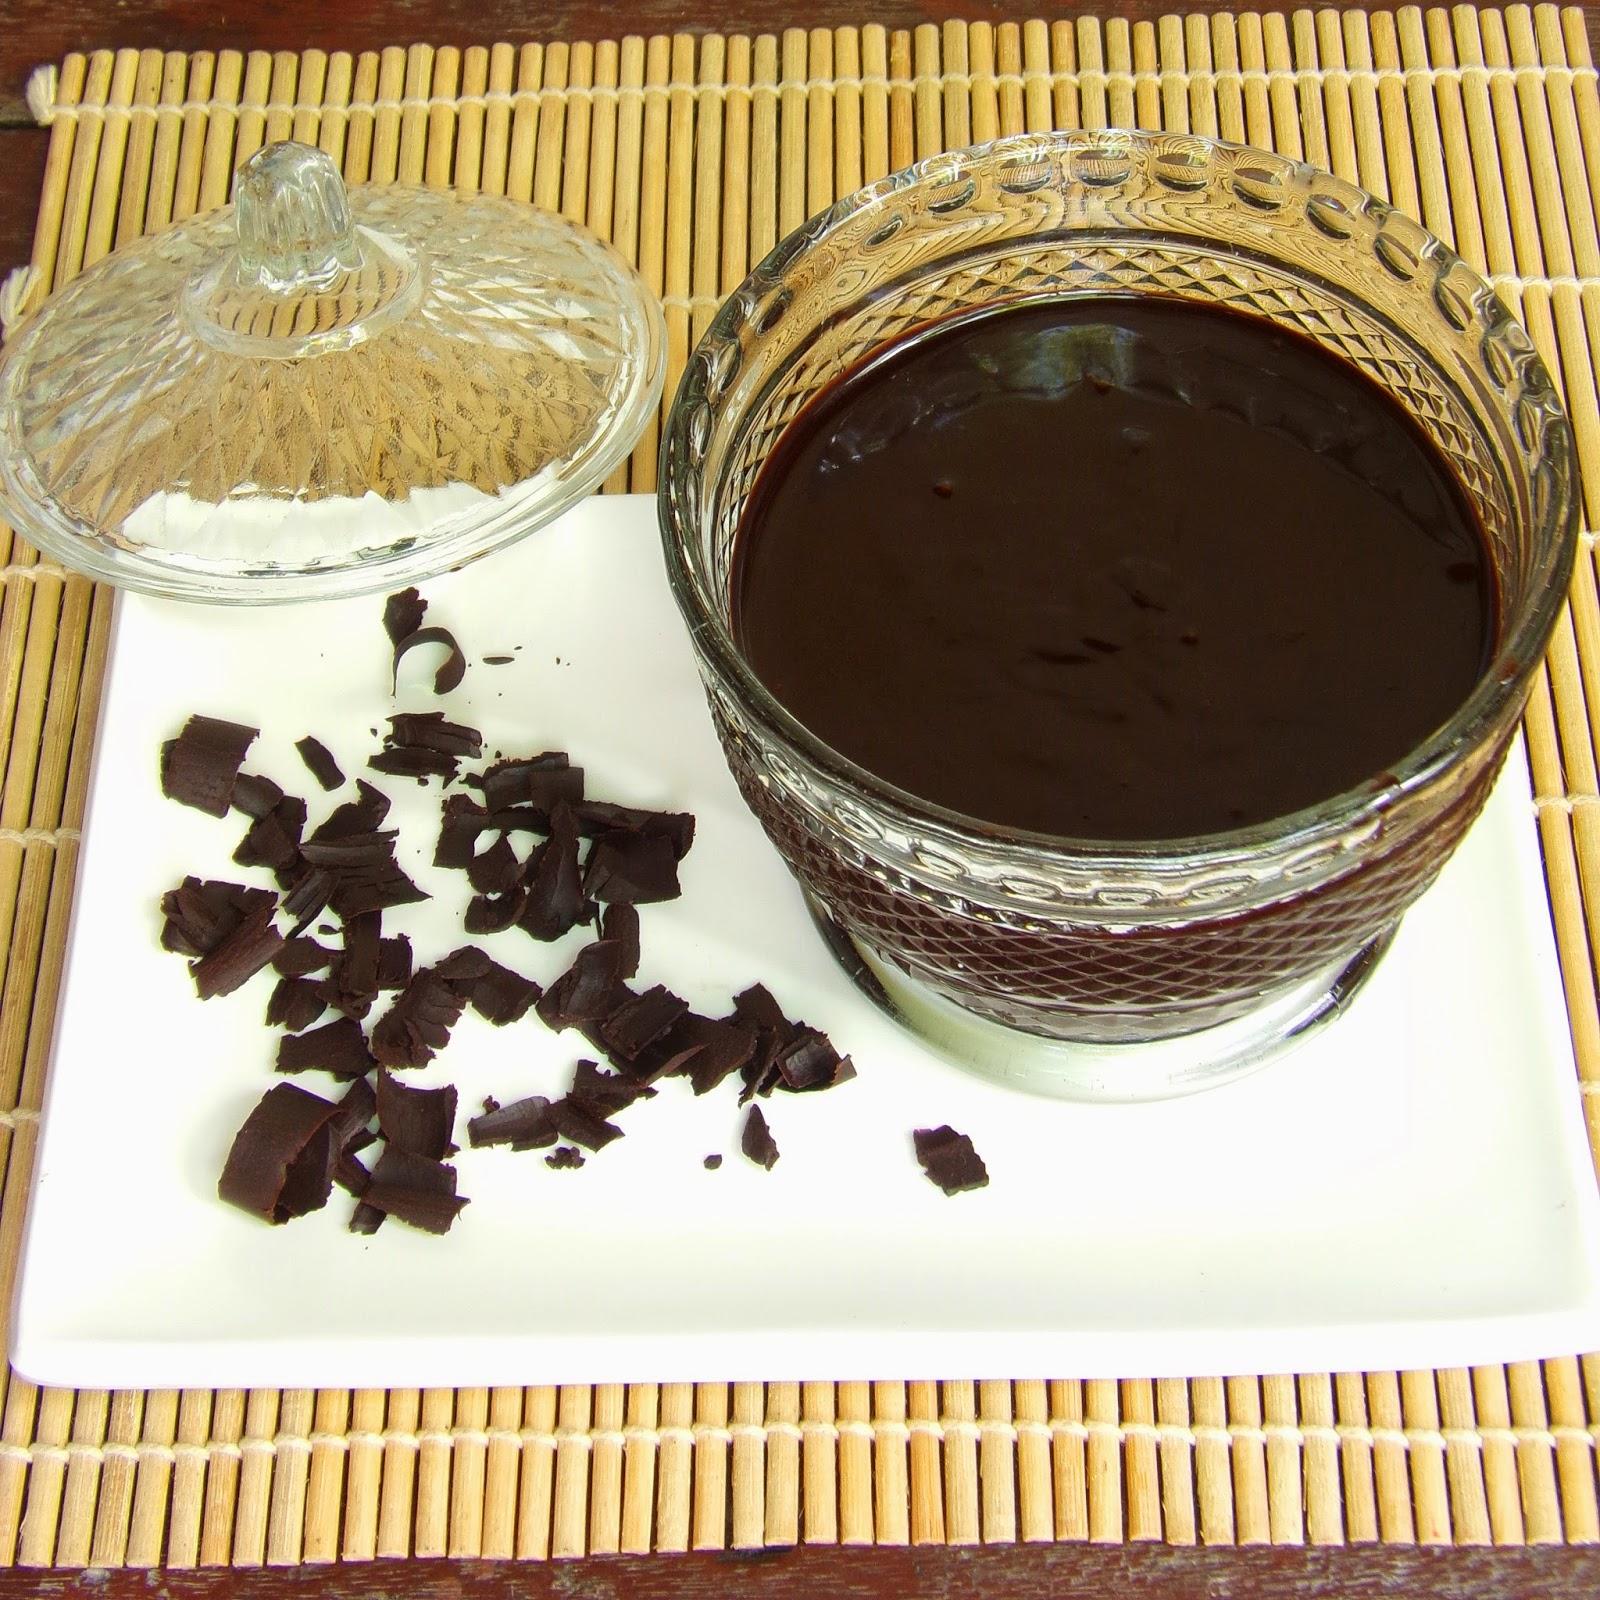 how to make homemade chocolate, homemade chocolate, chocolate ganache recipe, how to make chocolate ganache